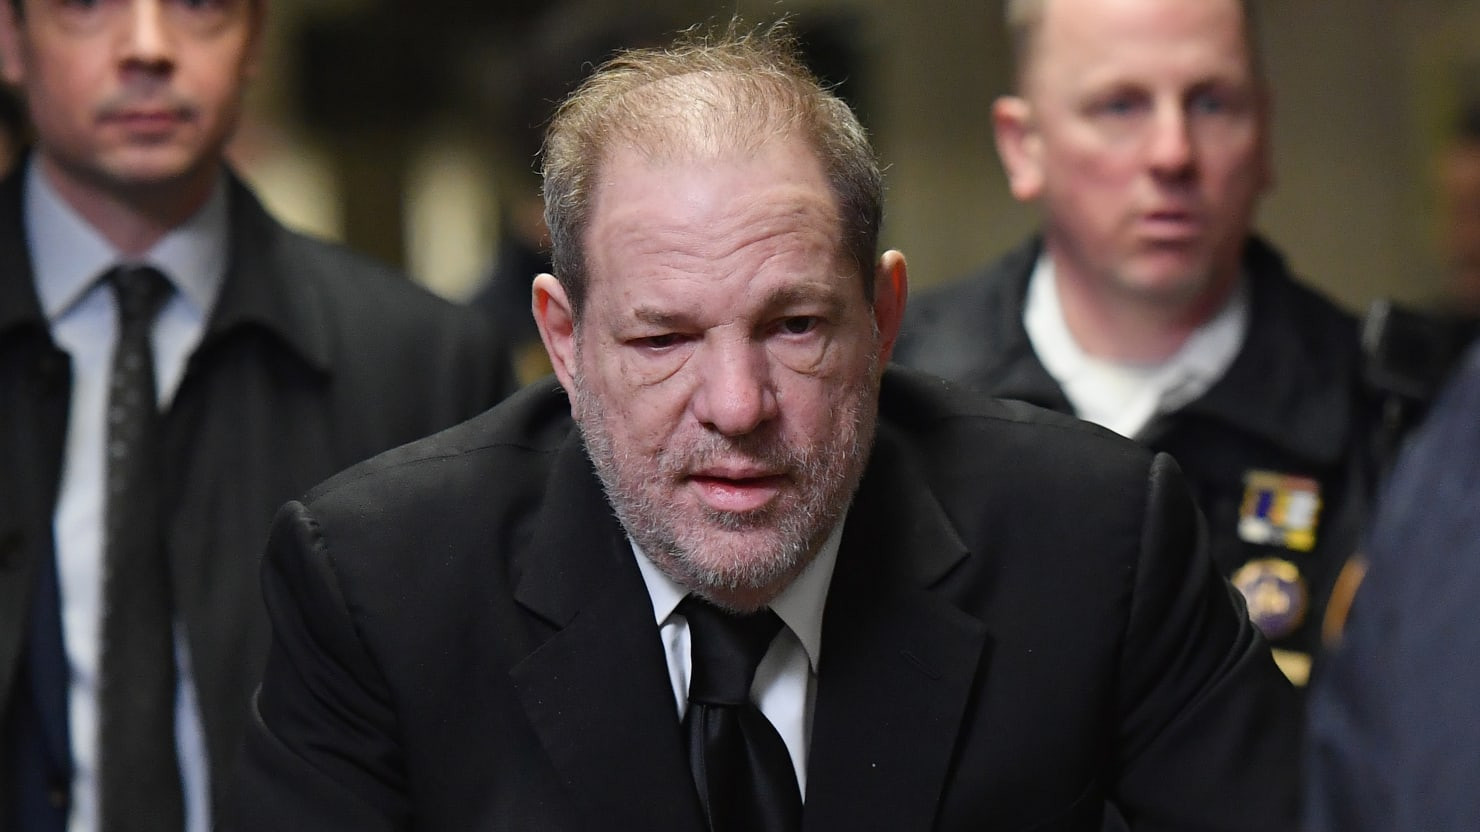 Five Jurors Chosen for Harvey Weinstein's NYC Trial So Far